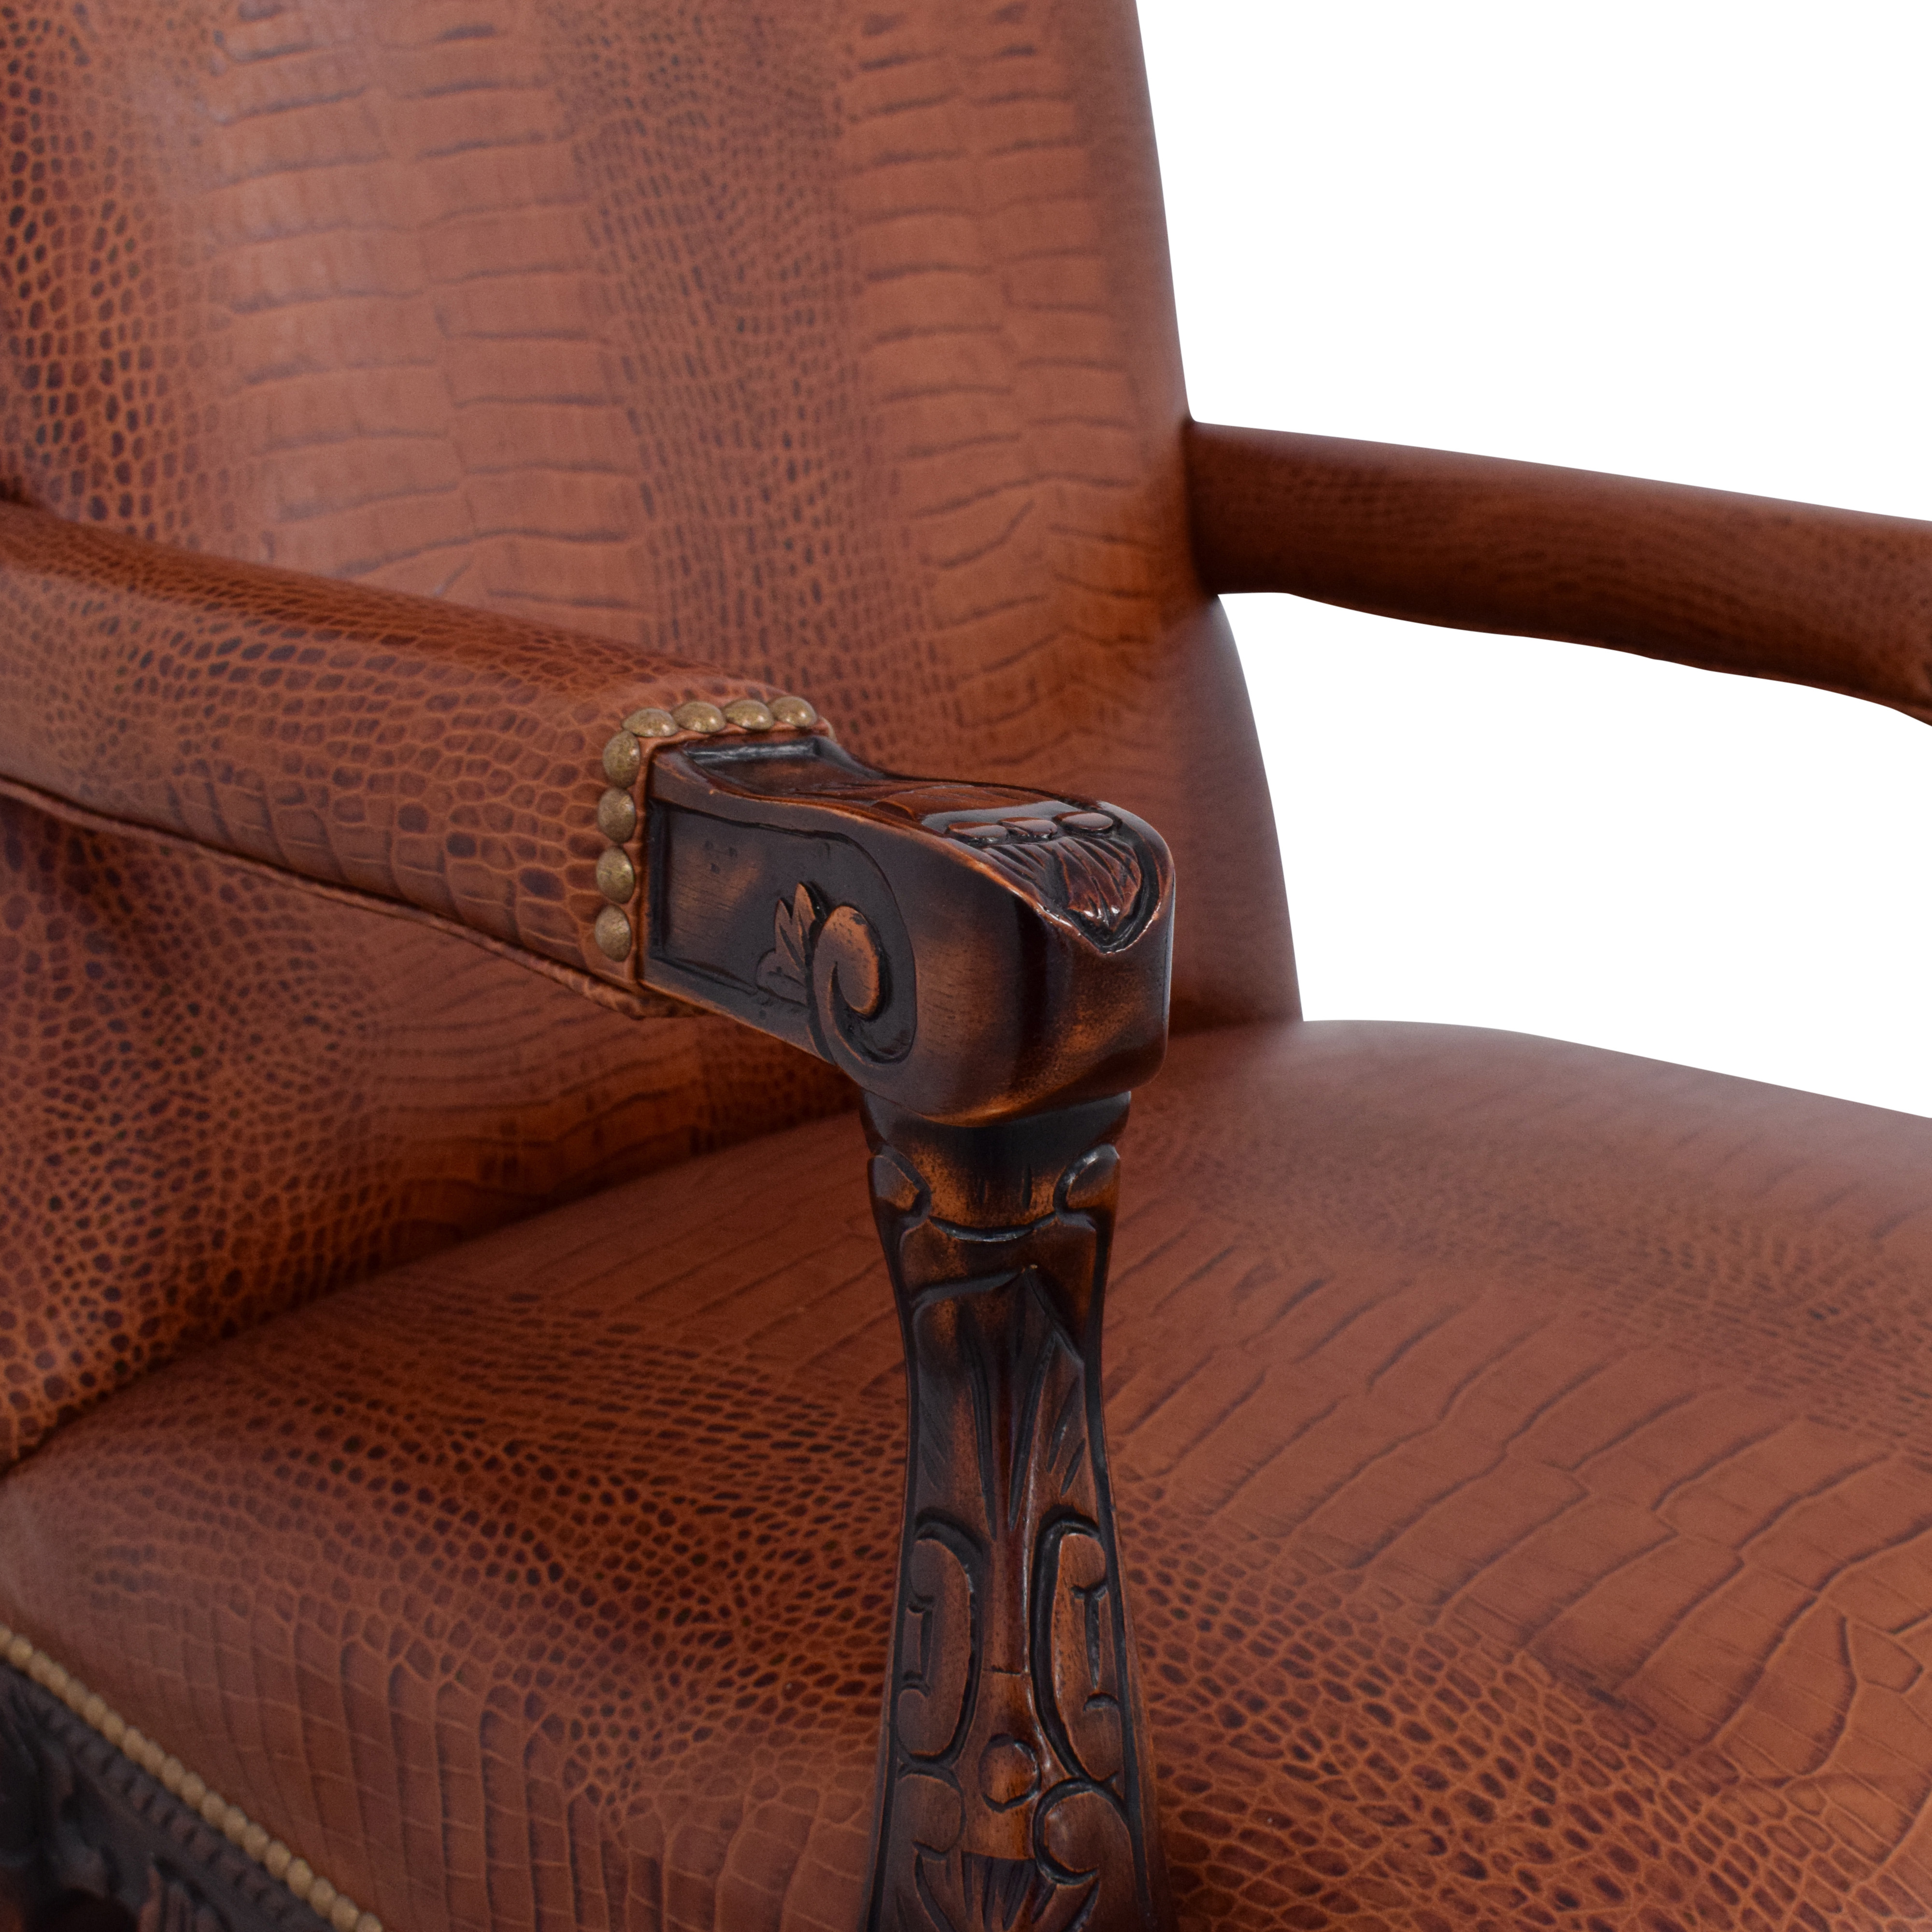 ABC Carpet & Home ABC Carpet & Home Bishop Chair price